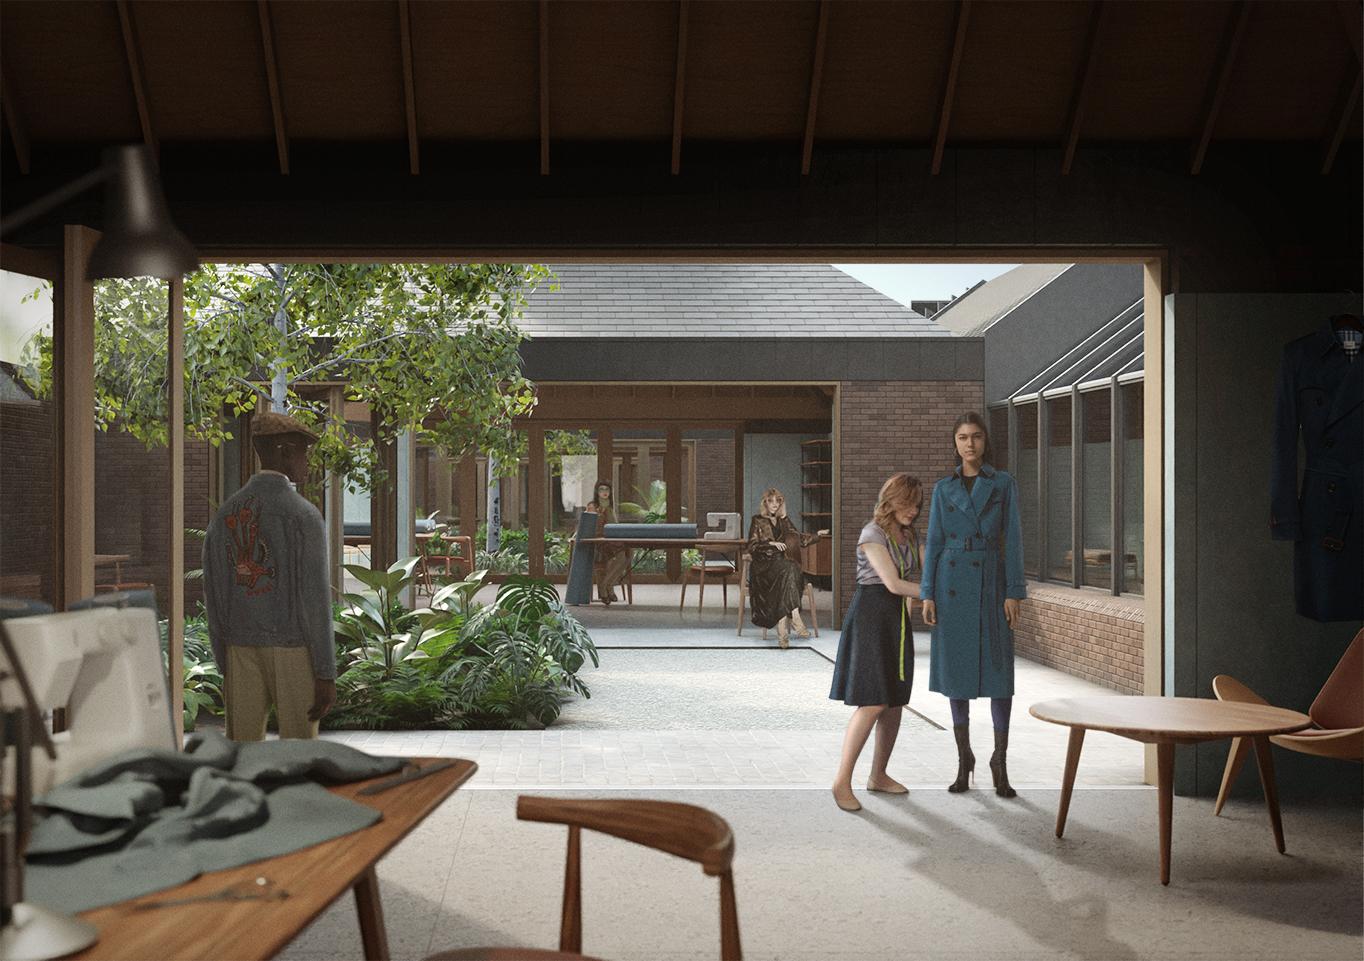 Design studios – Bromley Hall School